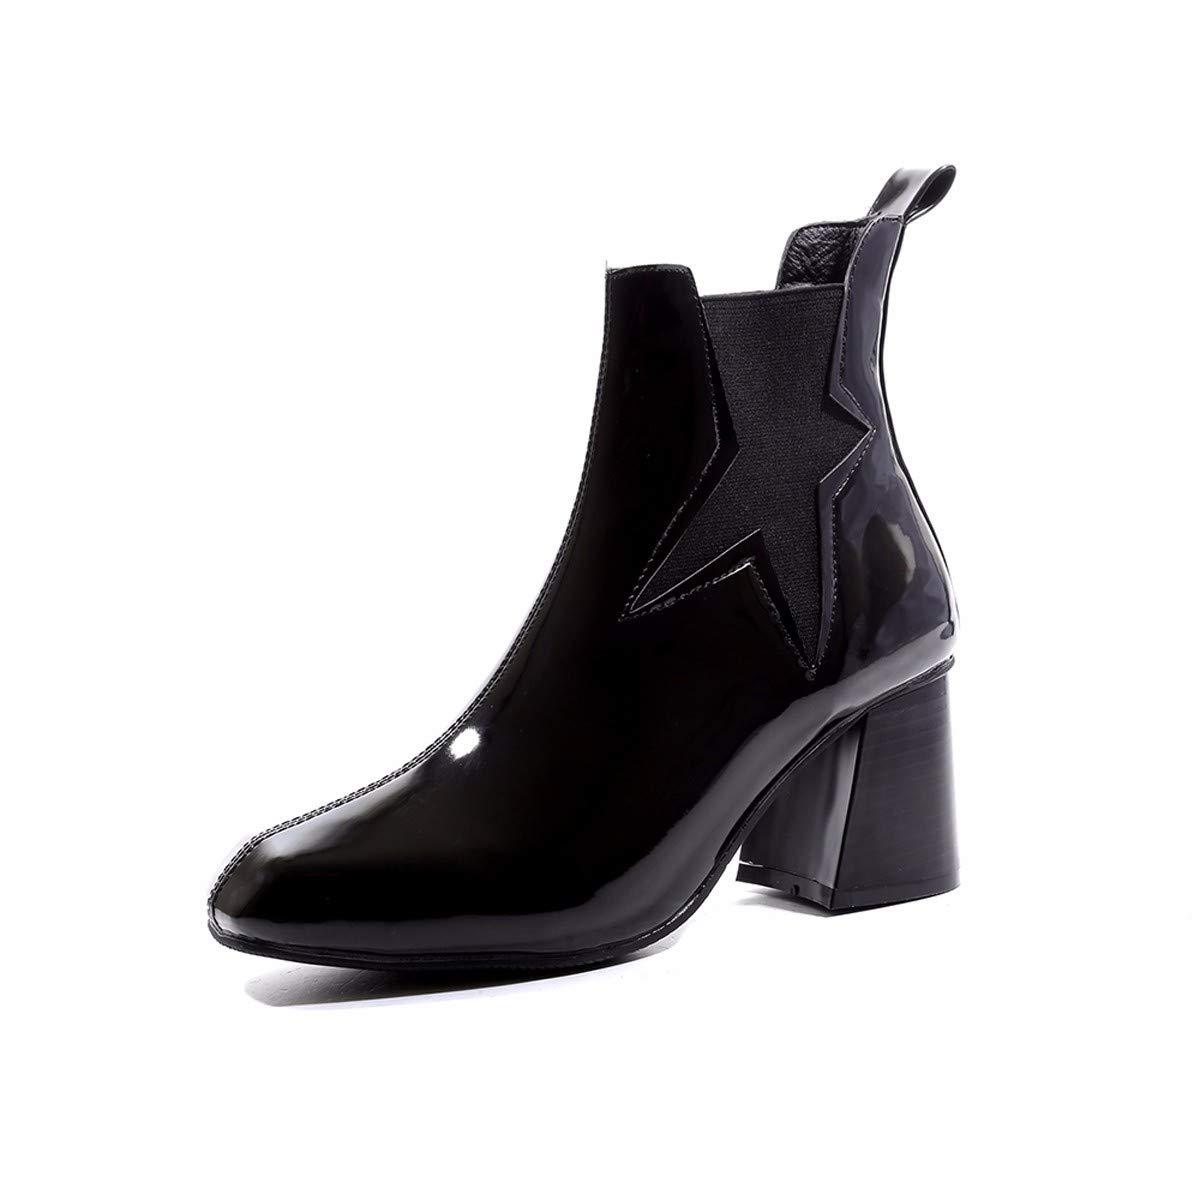 LBTSQ-Mode/Damenschuhe/Kurze Stiefel High 7Cm Harte Sohle Martin Stiefel Studenten Ritter Stiefel.